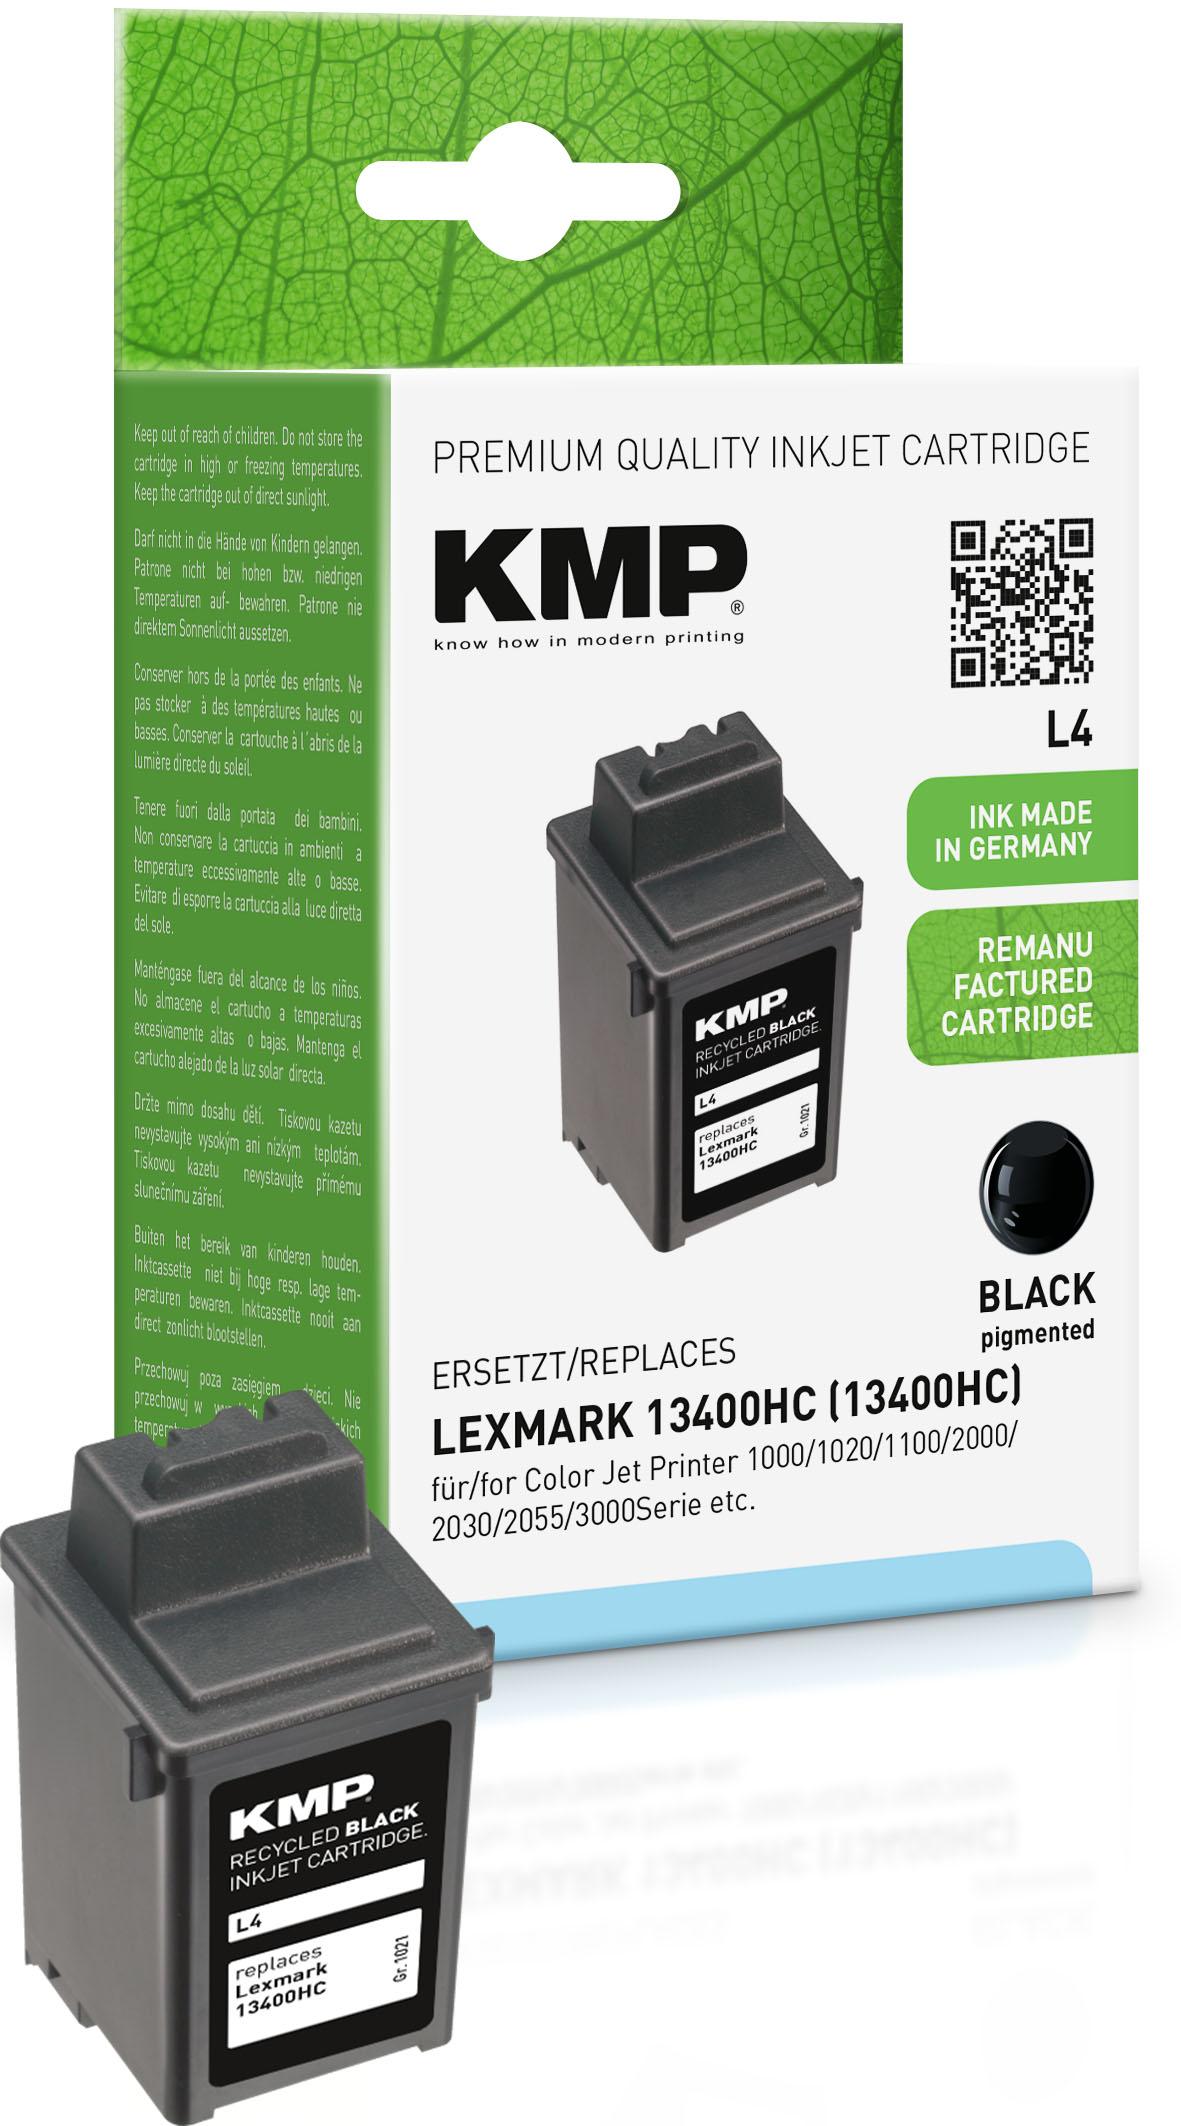 KMP Tintendruckkopf Pigmentierte Tinte schwarz (1021,4001, L4)